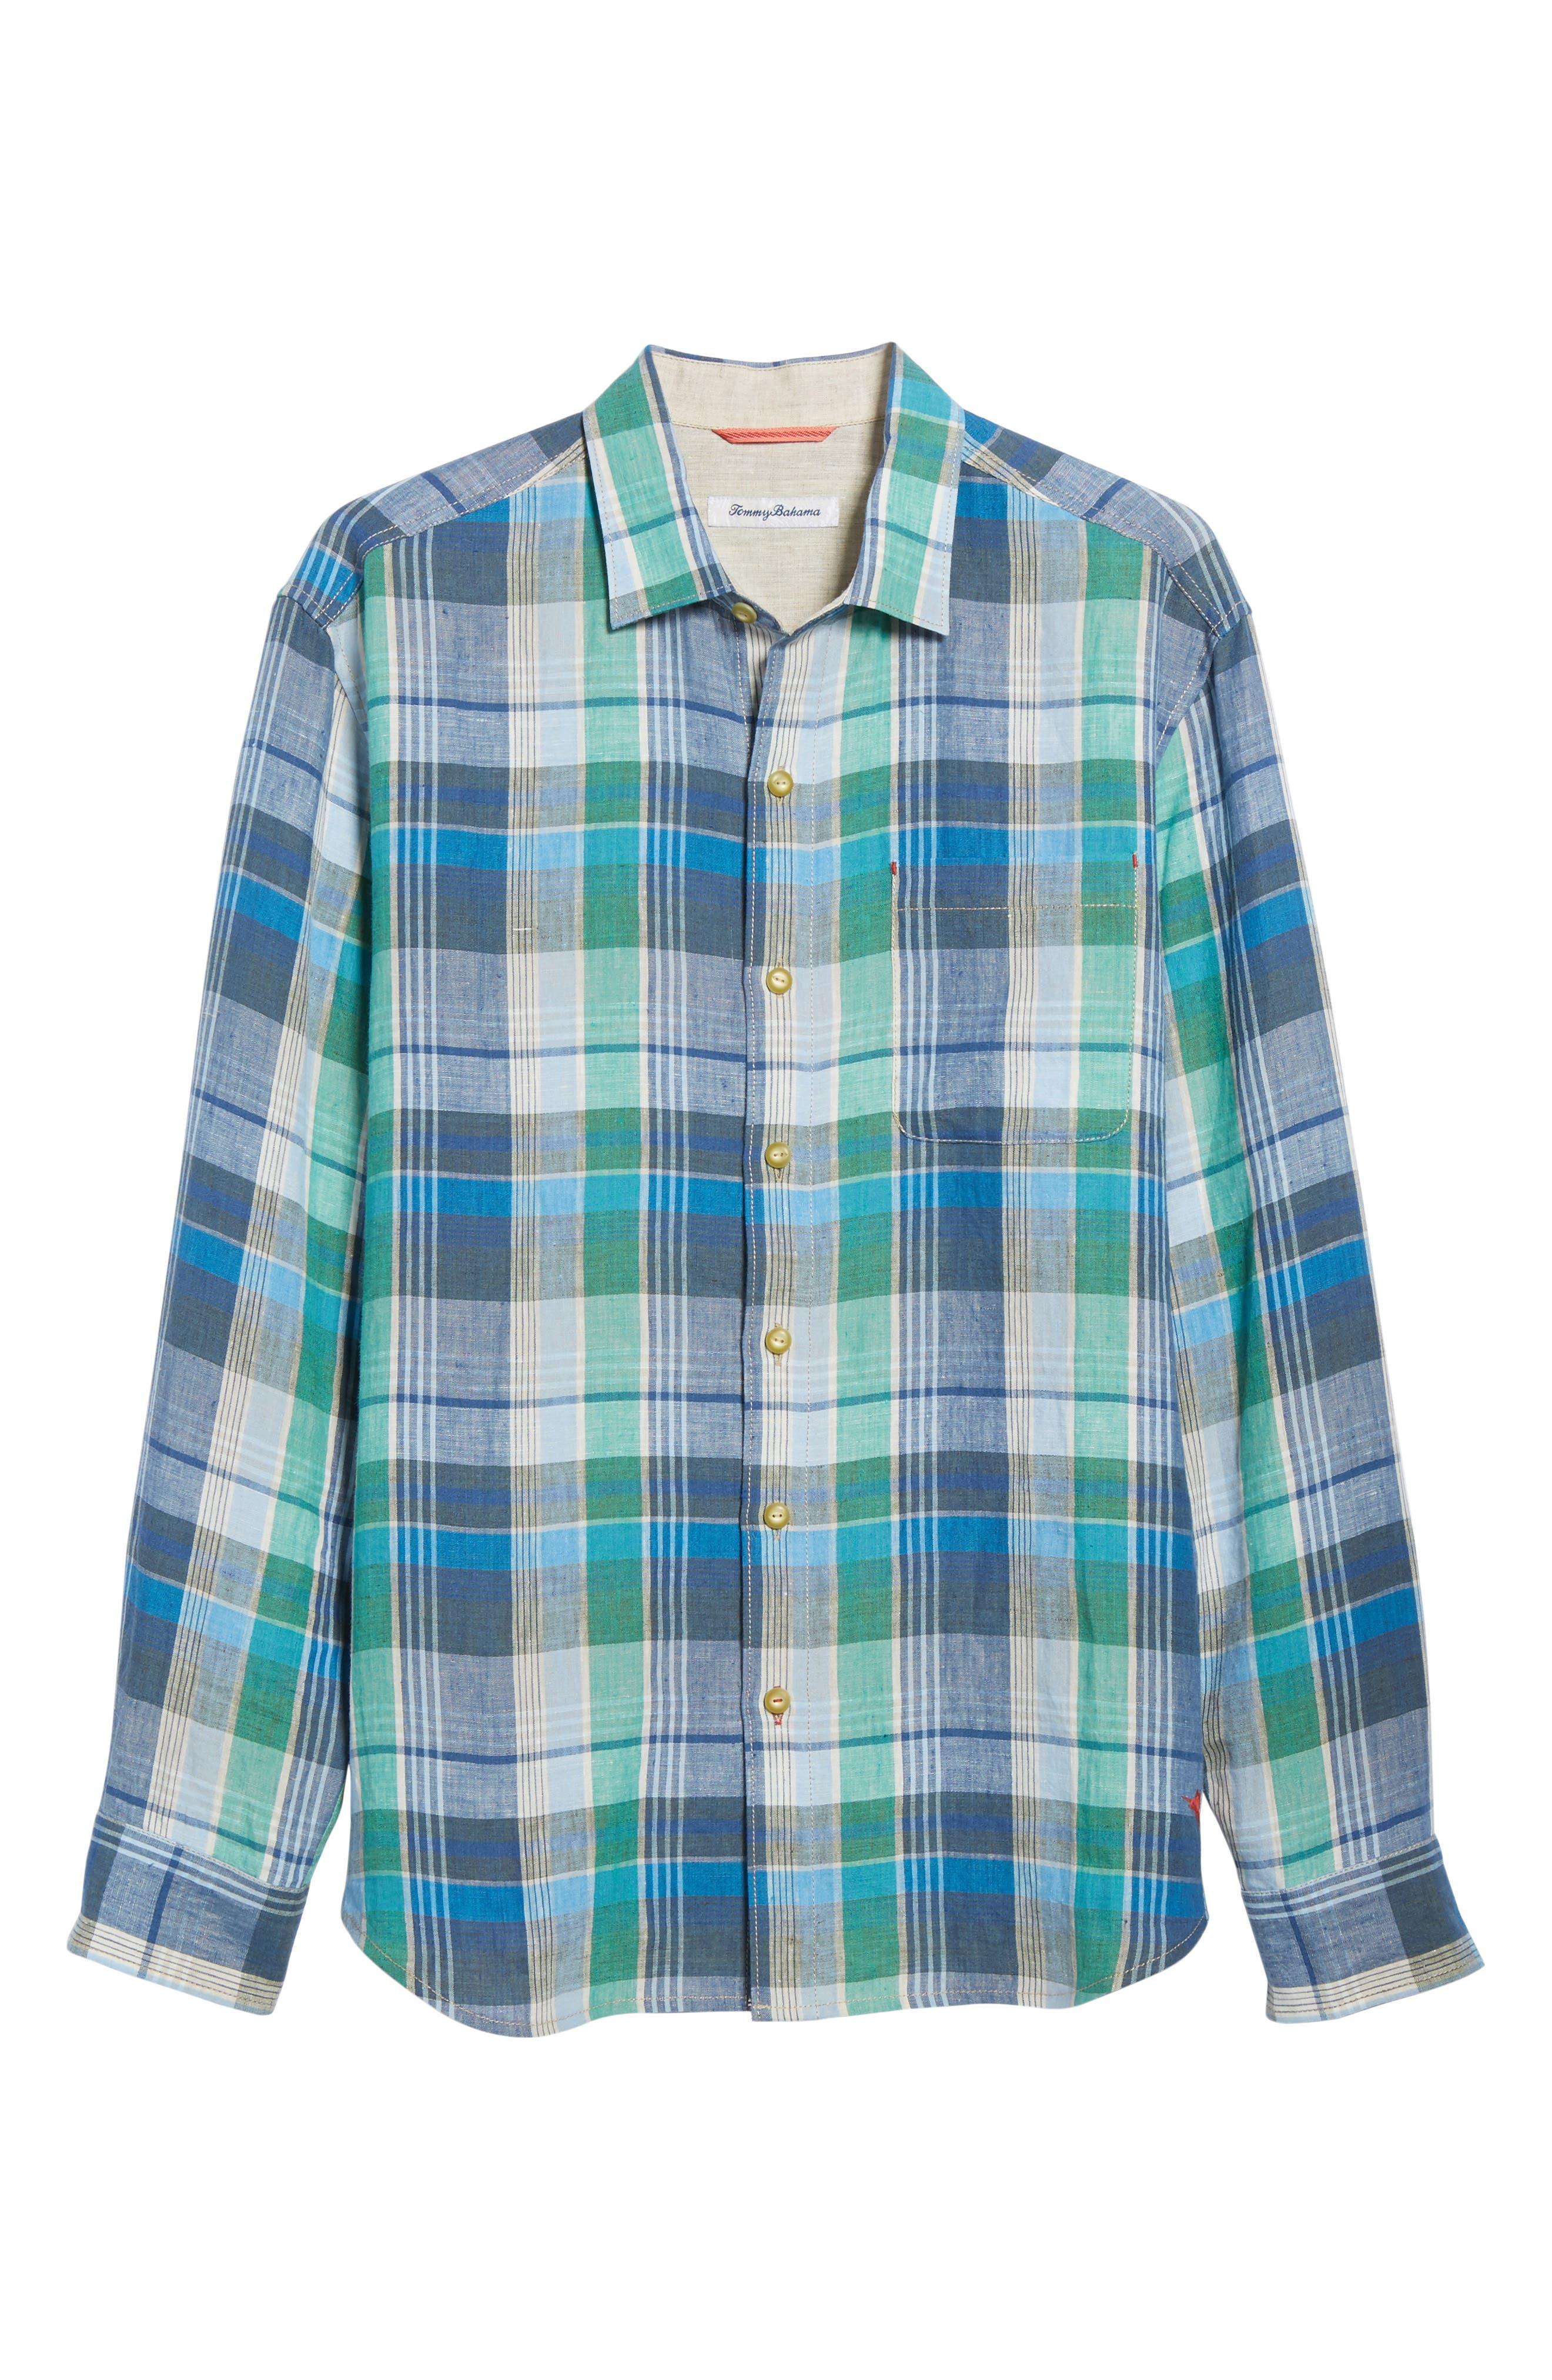 Vero Beach Madras Plaid Linen Sport Shirt,                             Alternate thumbnail 6, color,                             300